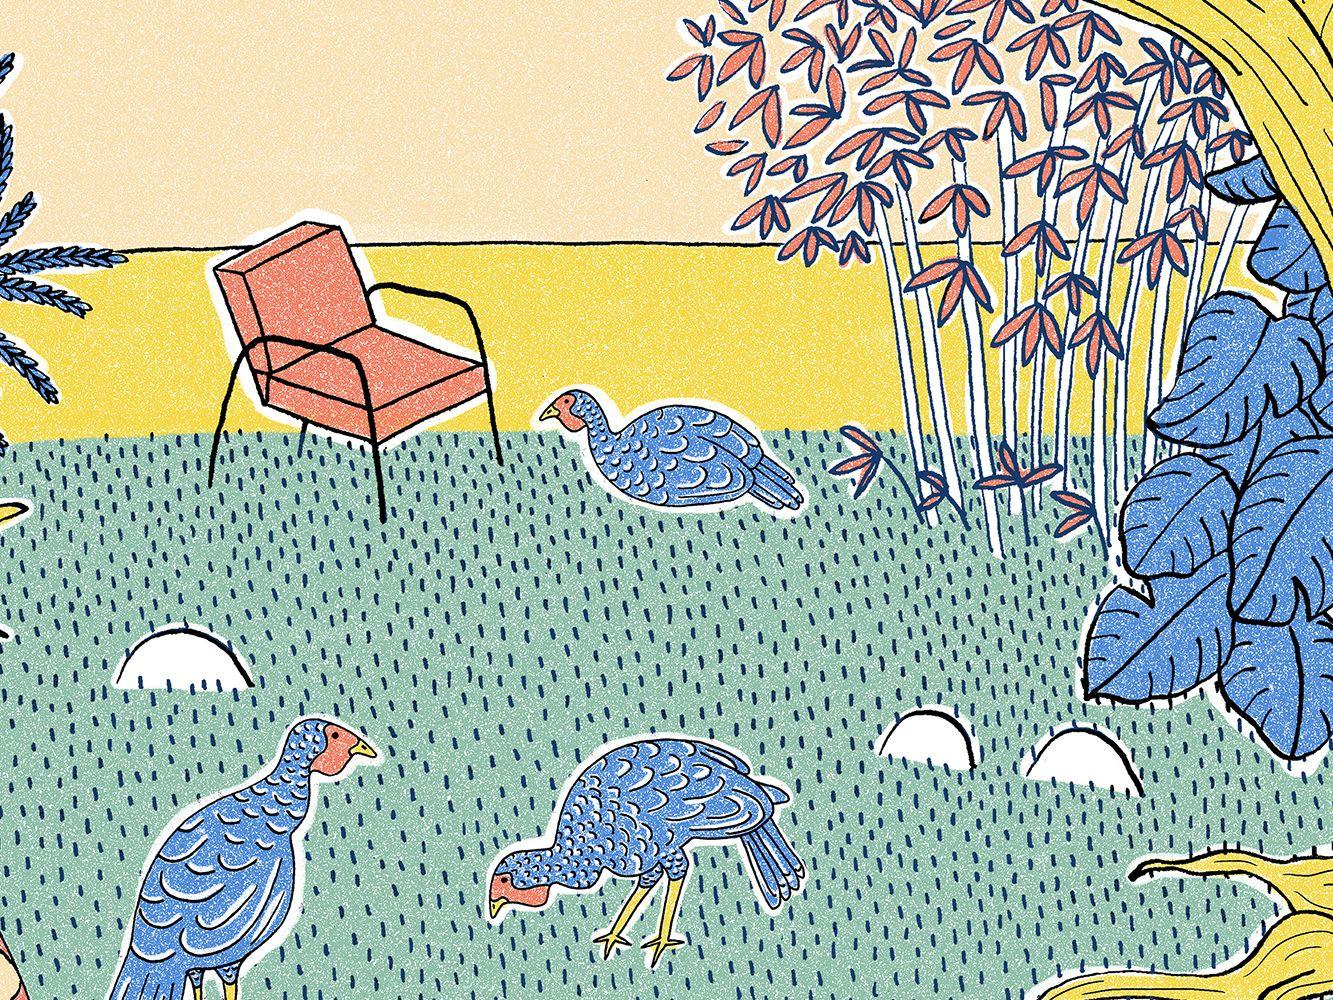 Illustration of a tropical garden scene.